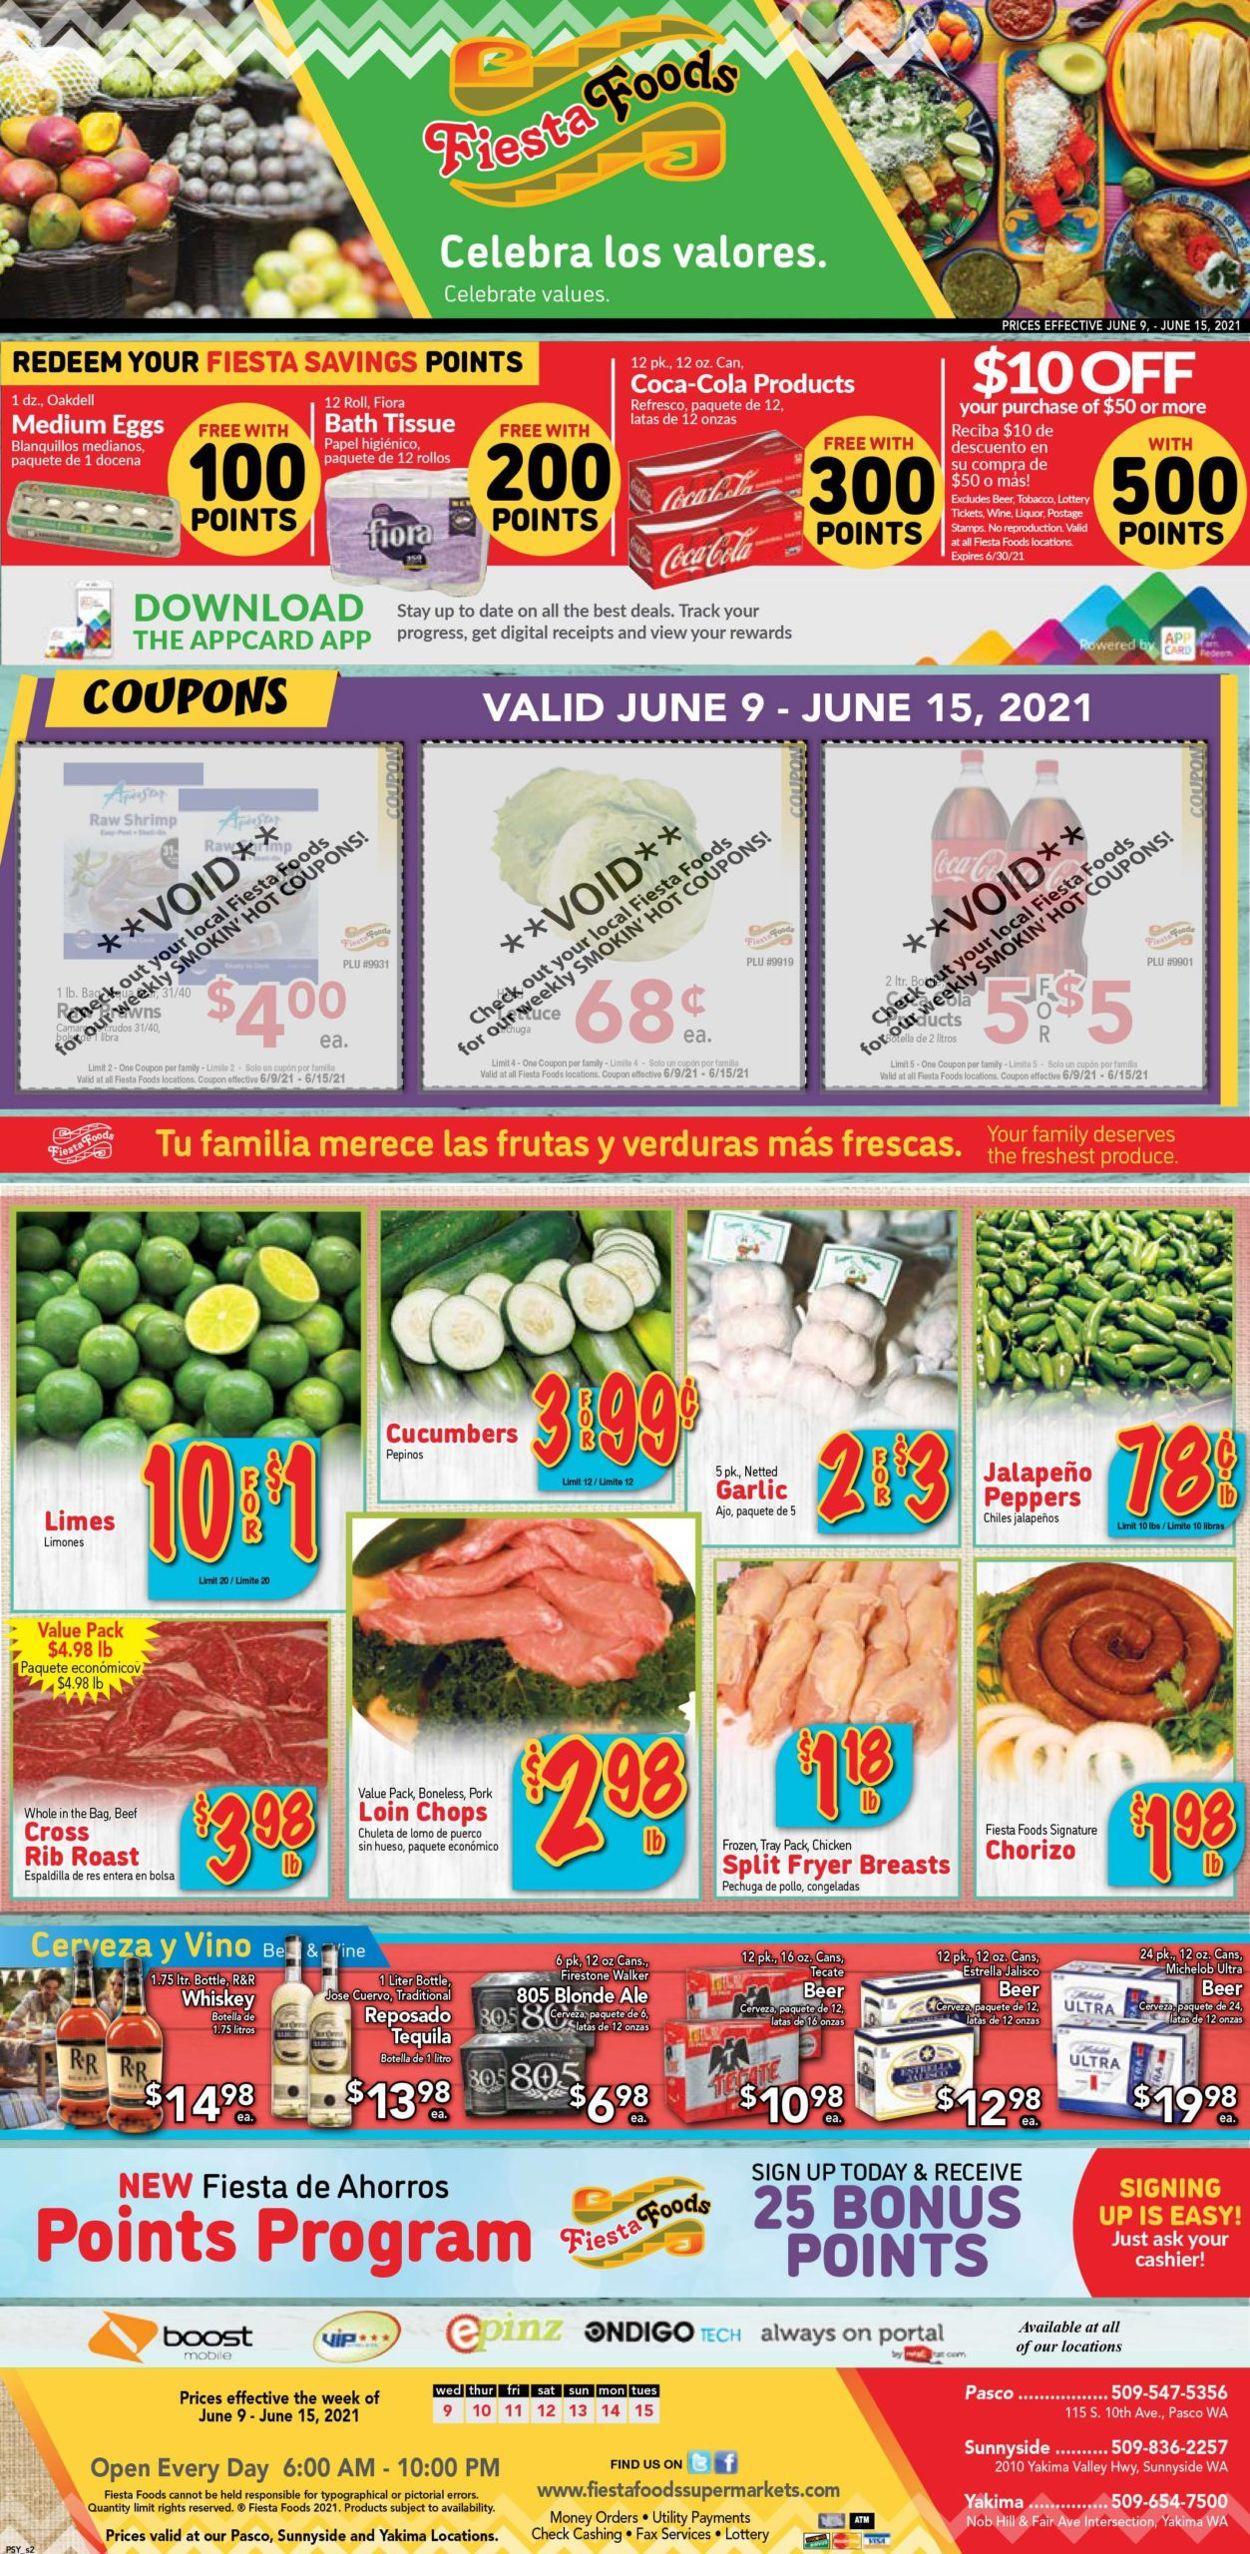 Fiesta Foods SuperMarkets Weekly Ad Circular - valid 06/09-06/15/2021